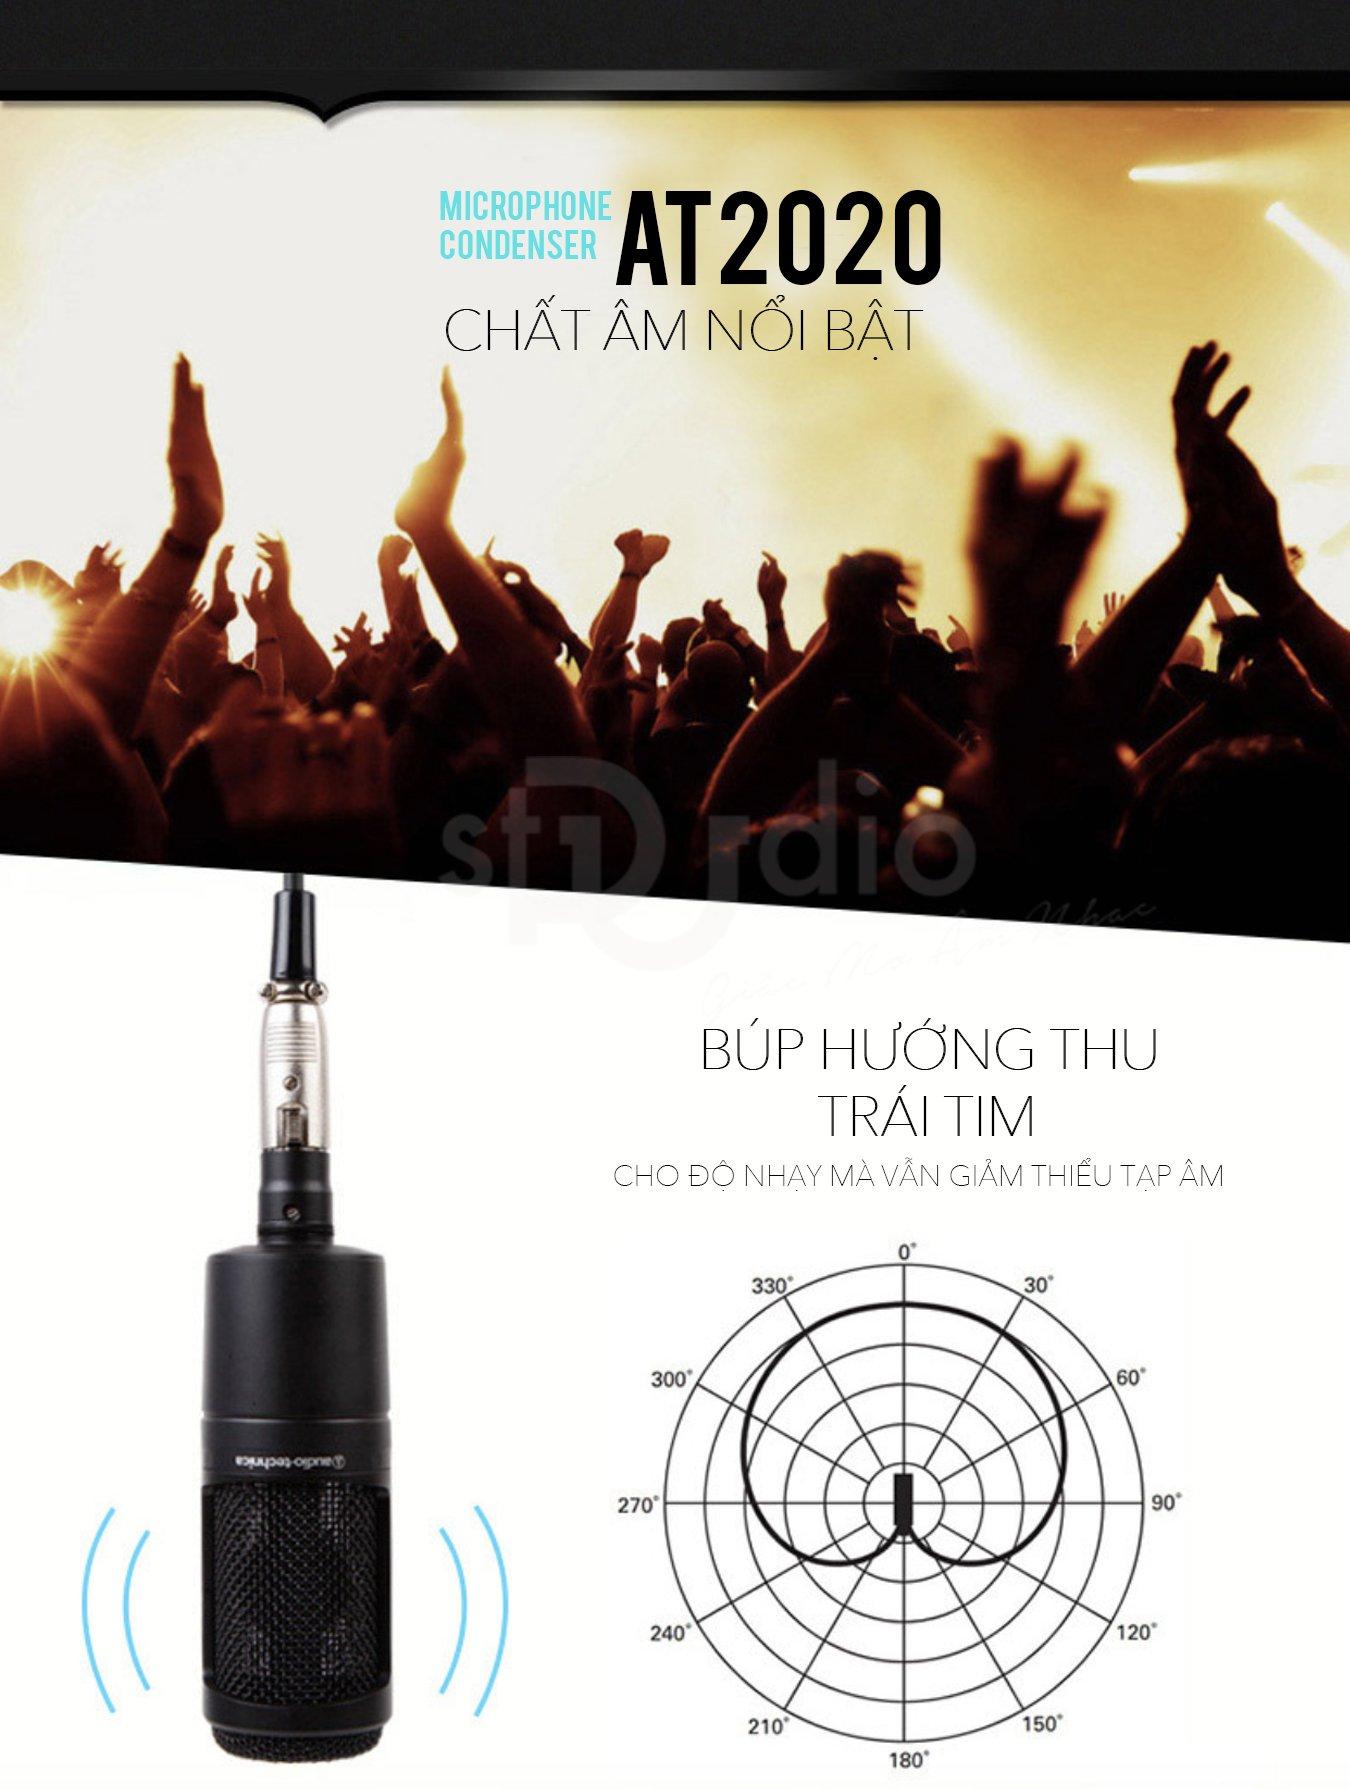 Microphone Audio Techina AT2020, Micro thu âm Condenser chuyên nghiệp